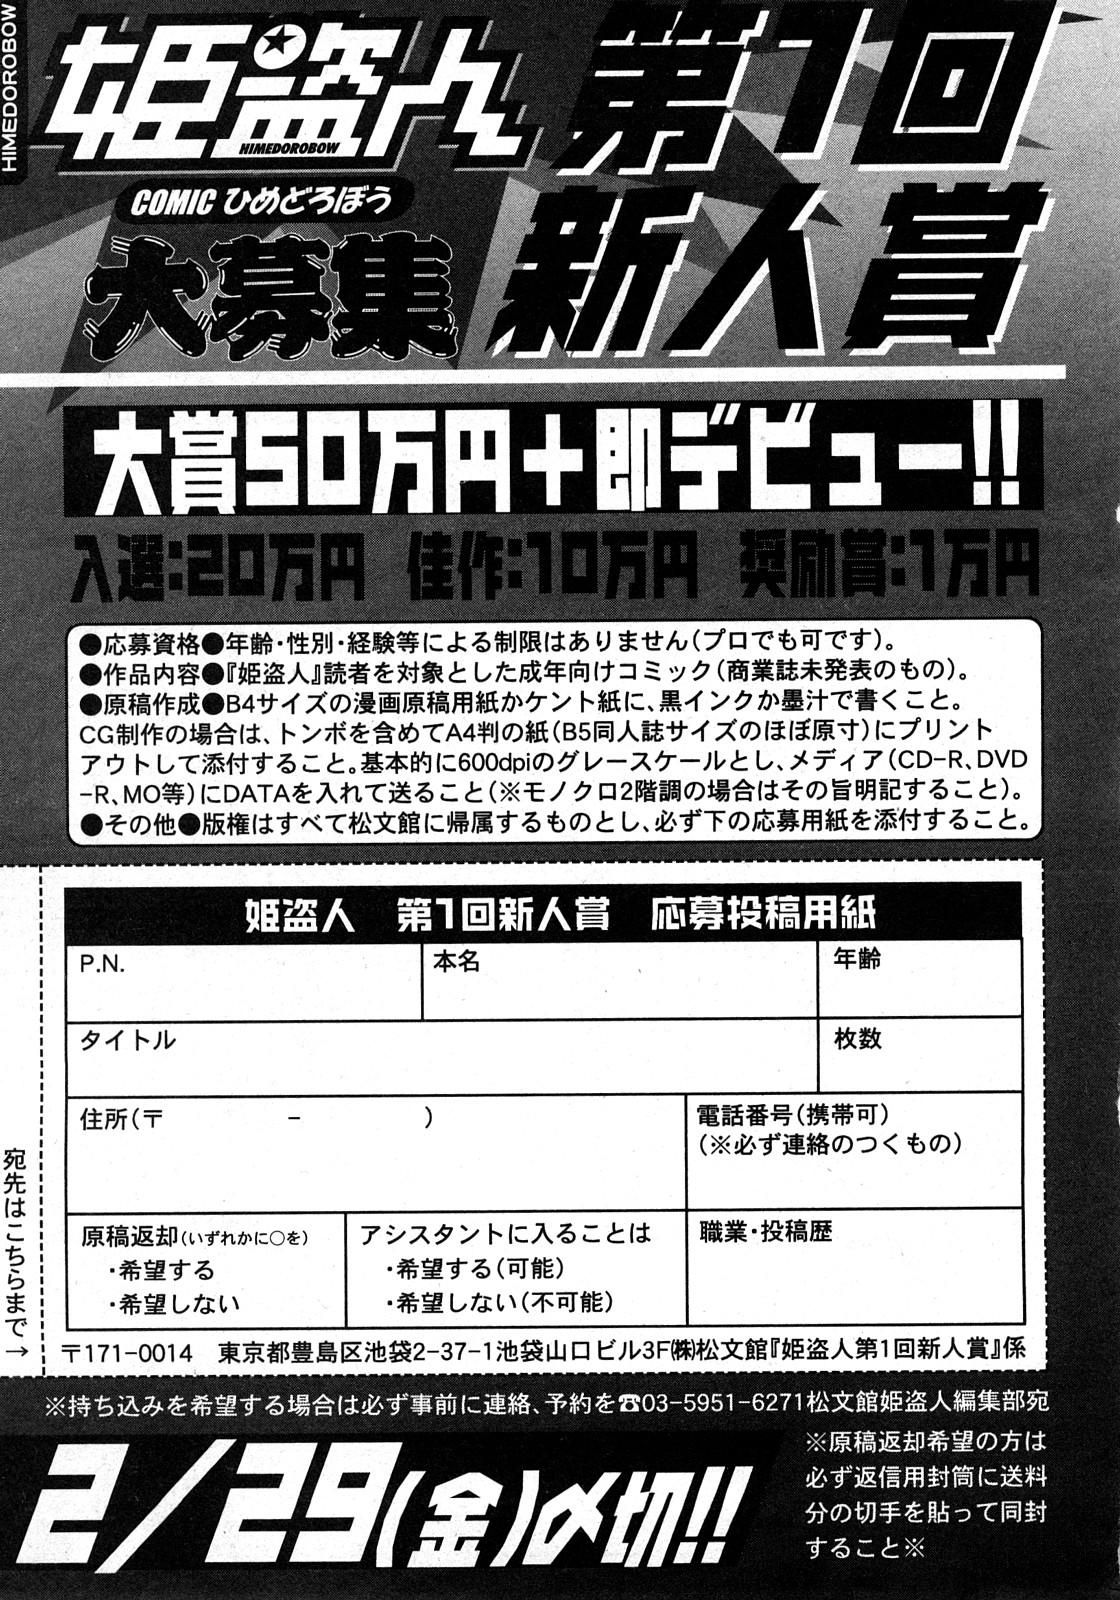 COMIC Hime Dorobou 2008-03 319